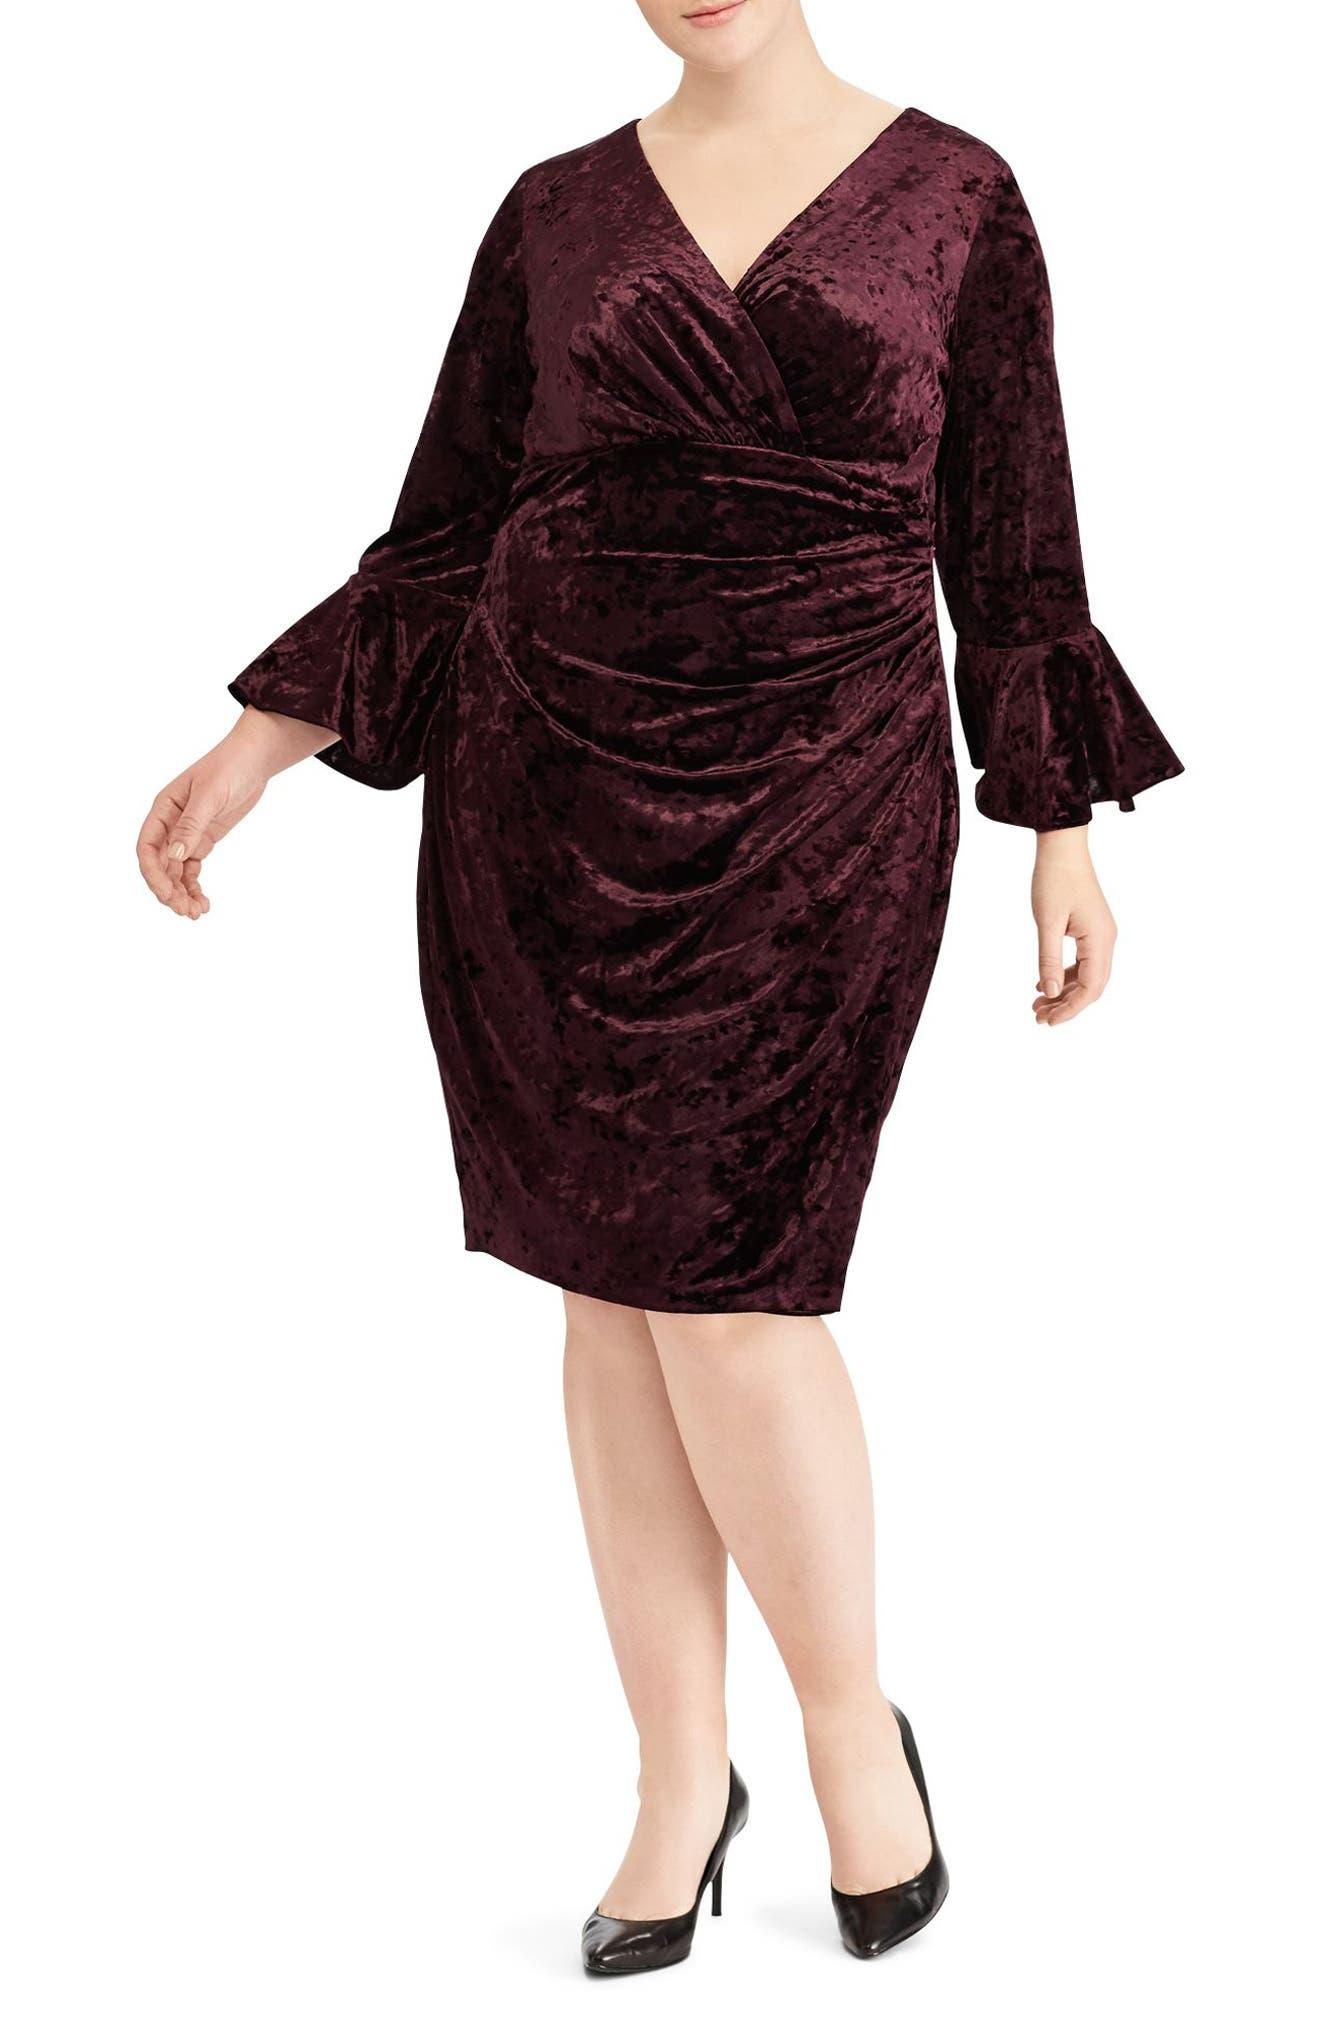 Ralph Lauren Ruched Crushed Velvet Sheath Dress (Plus Size)